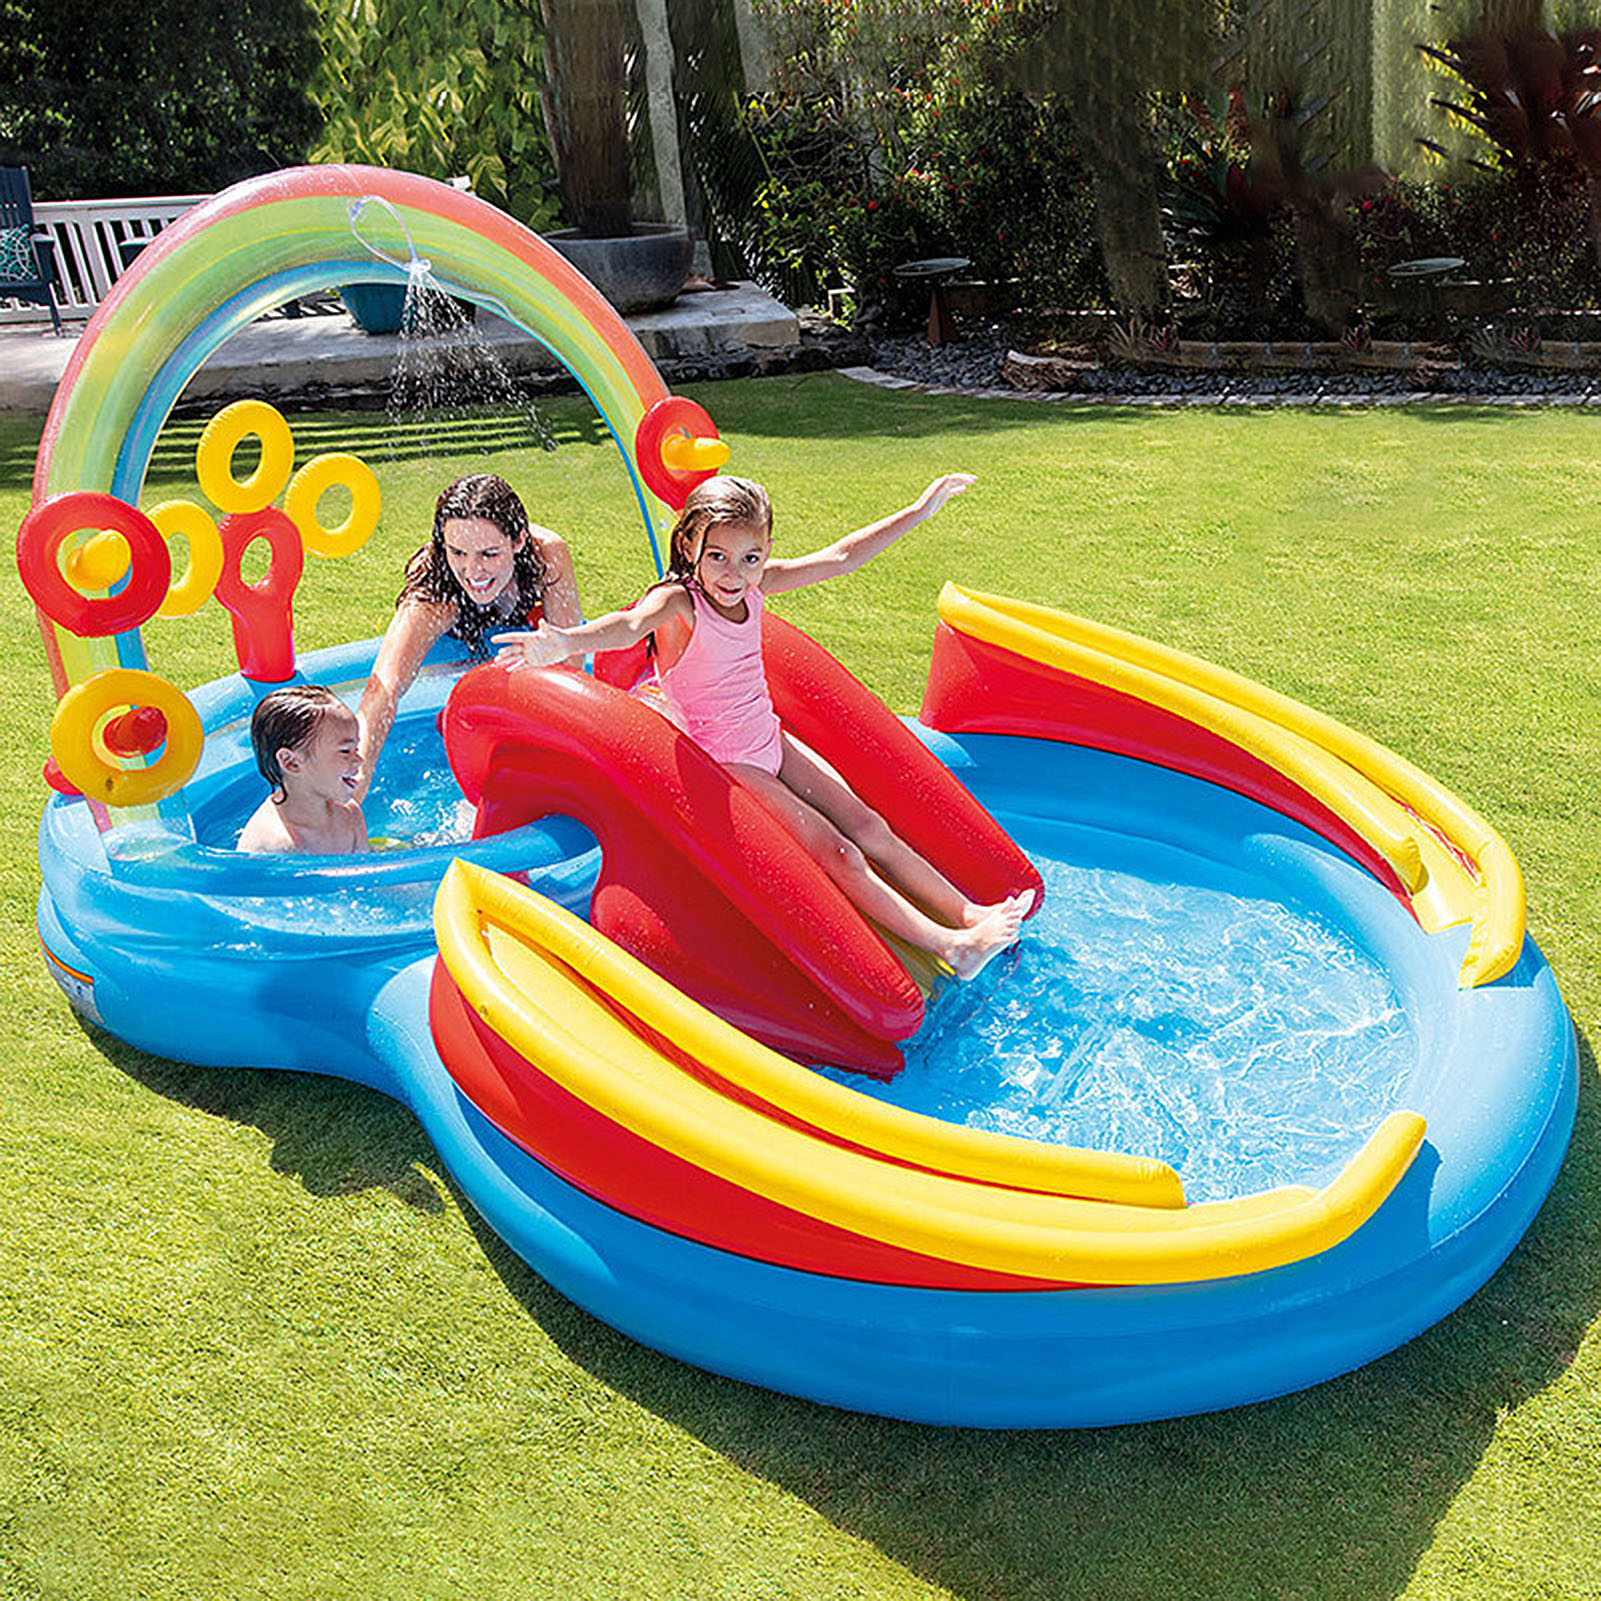 Fun Lawn Water Slides Pools Inflatable Pool Water Slide Inflatable Swimming Pool Unique Children Paddling Pool